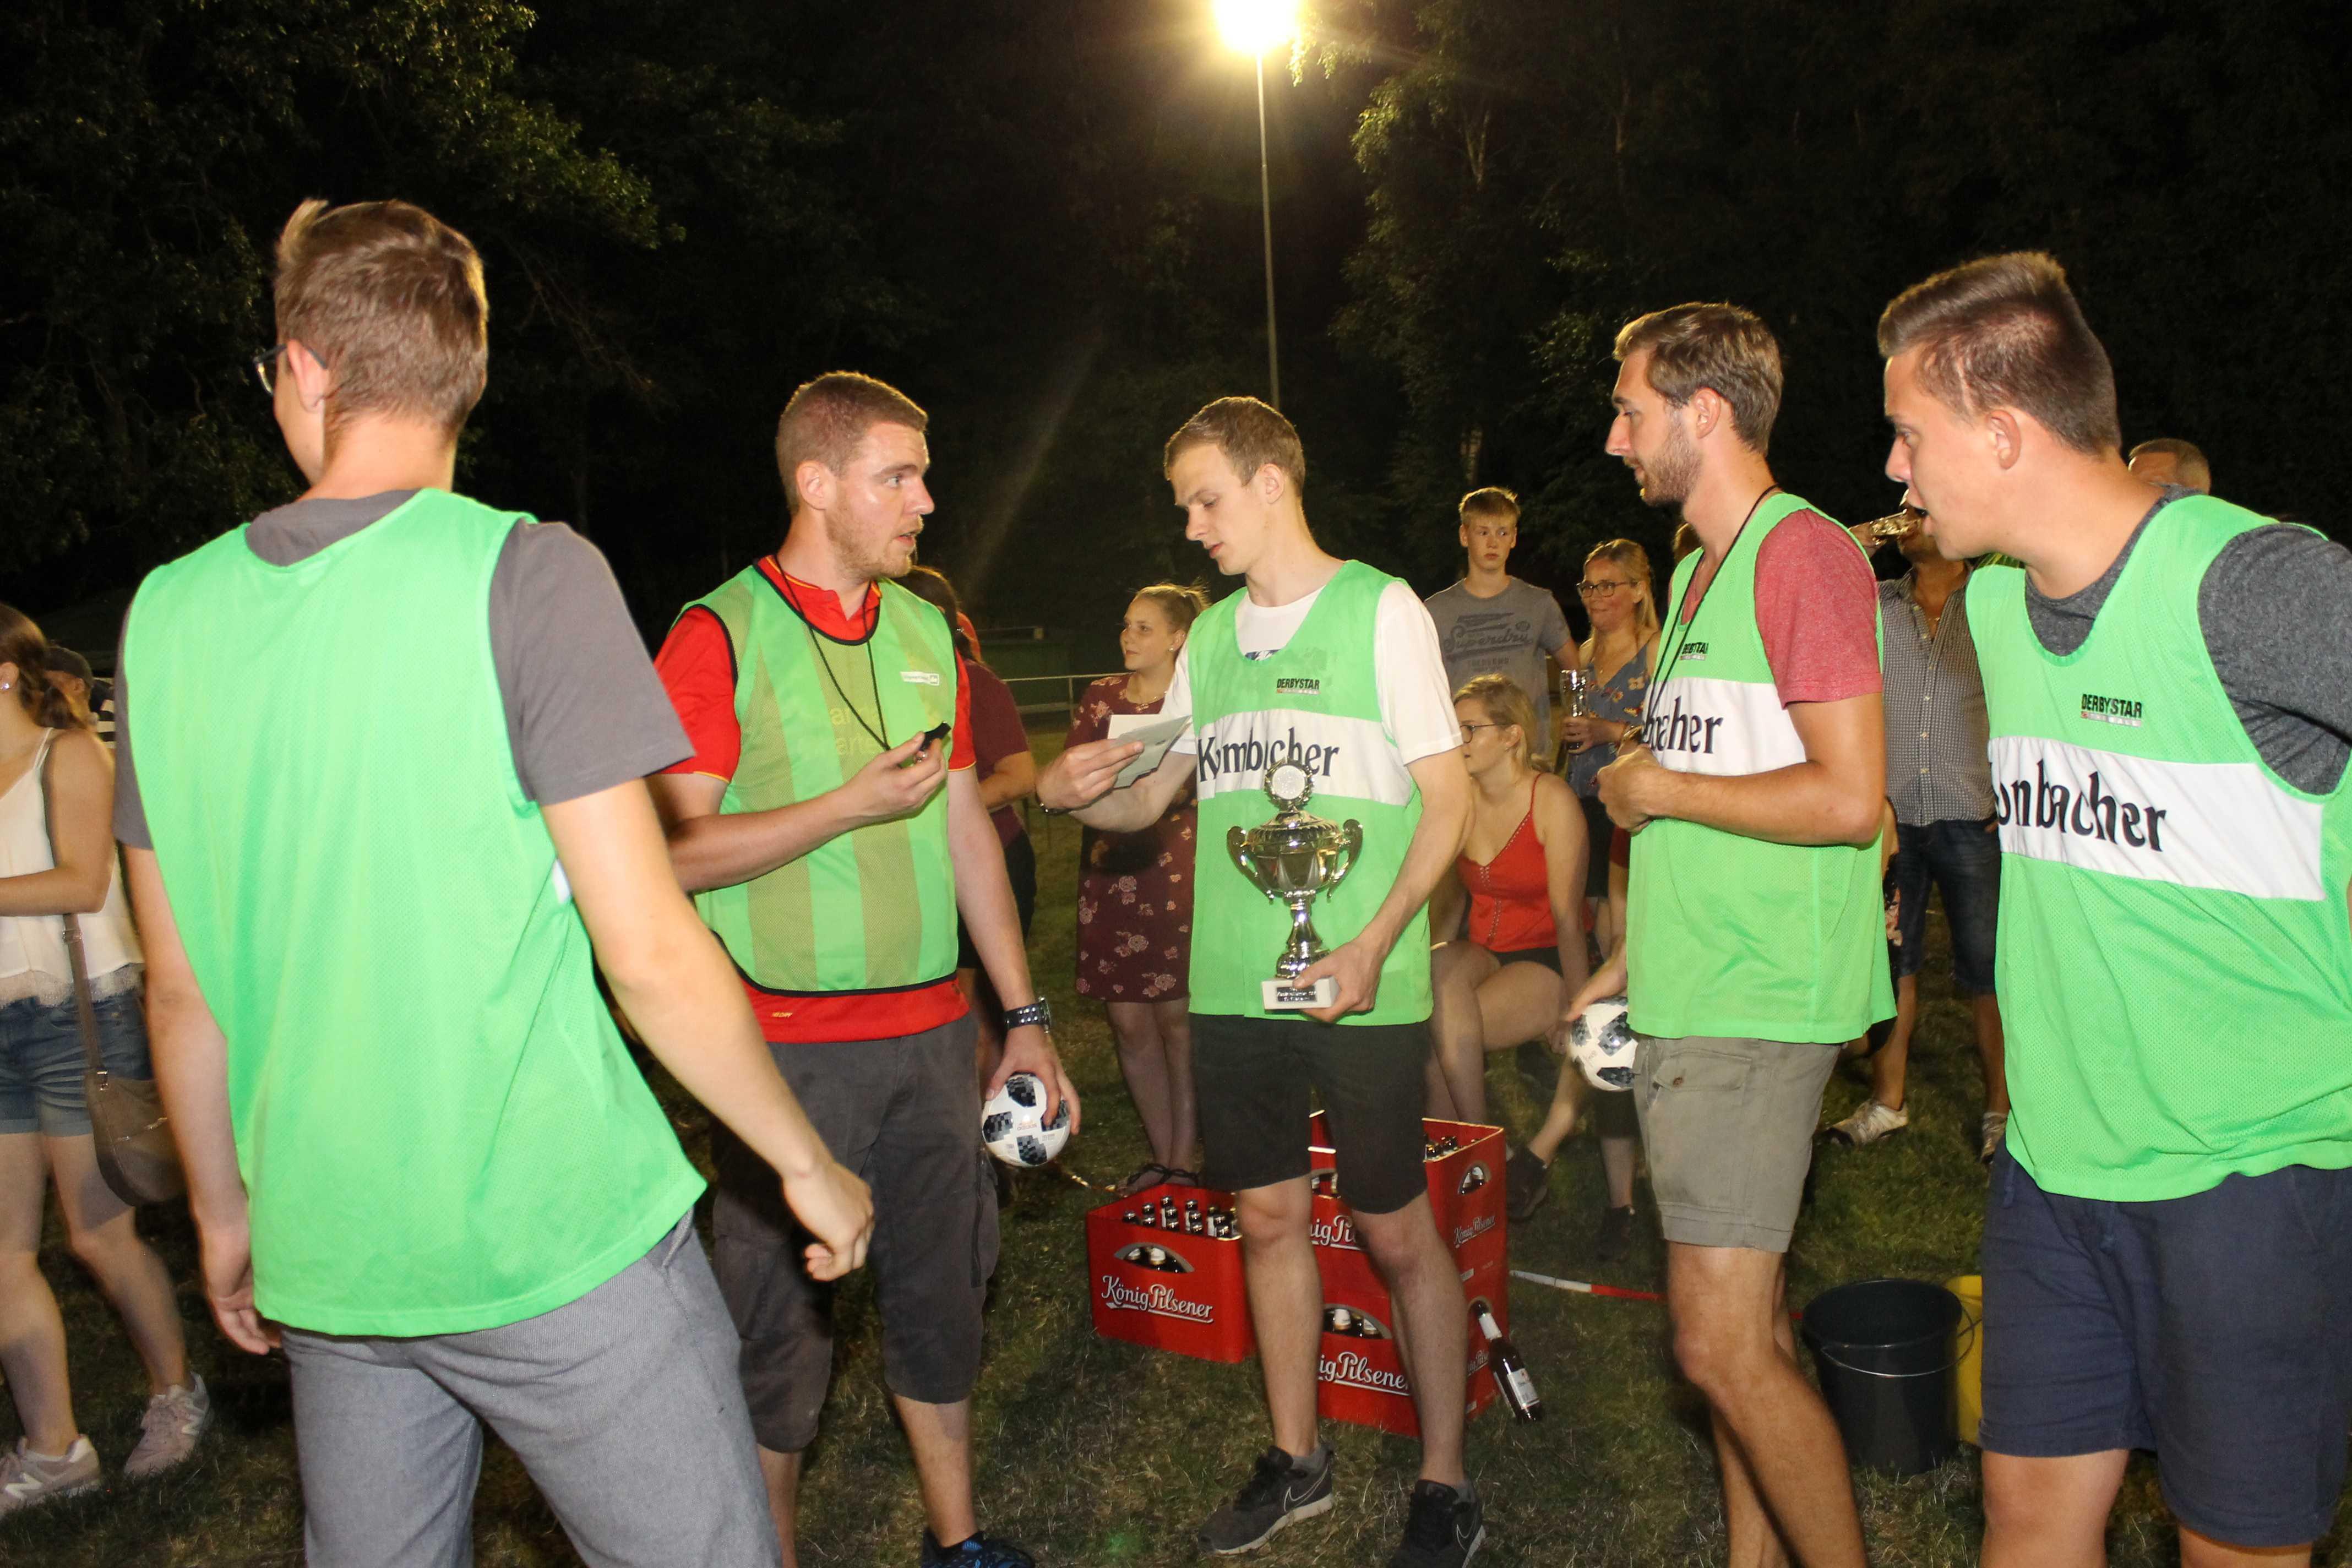 2018-07-27 Sportwoche - Flunkyball Turnier (88)